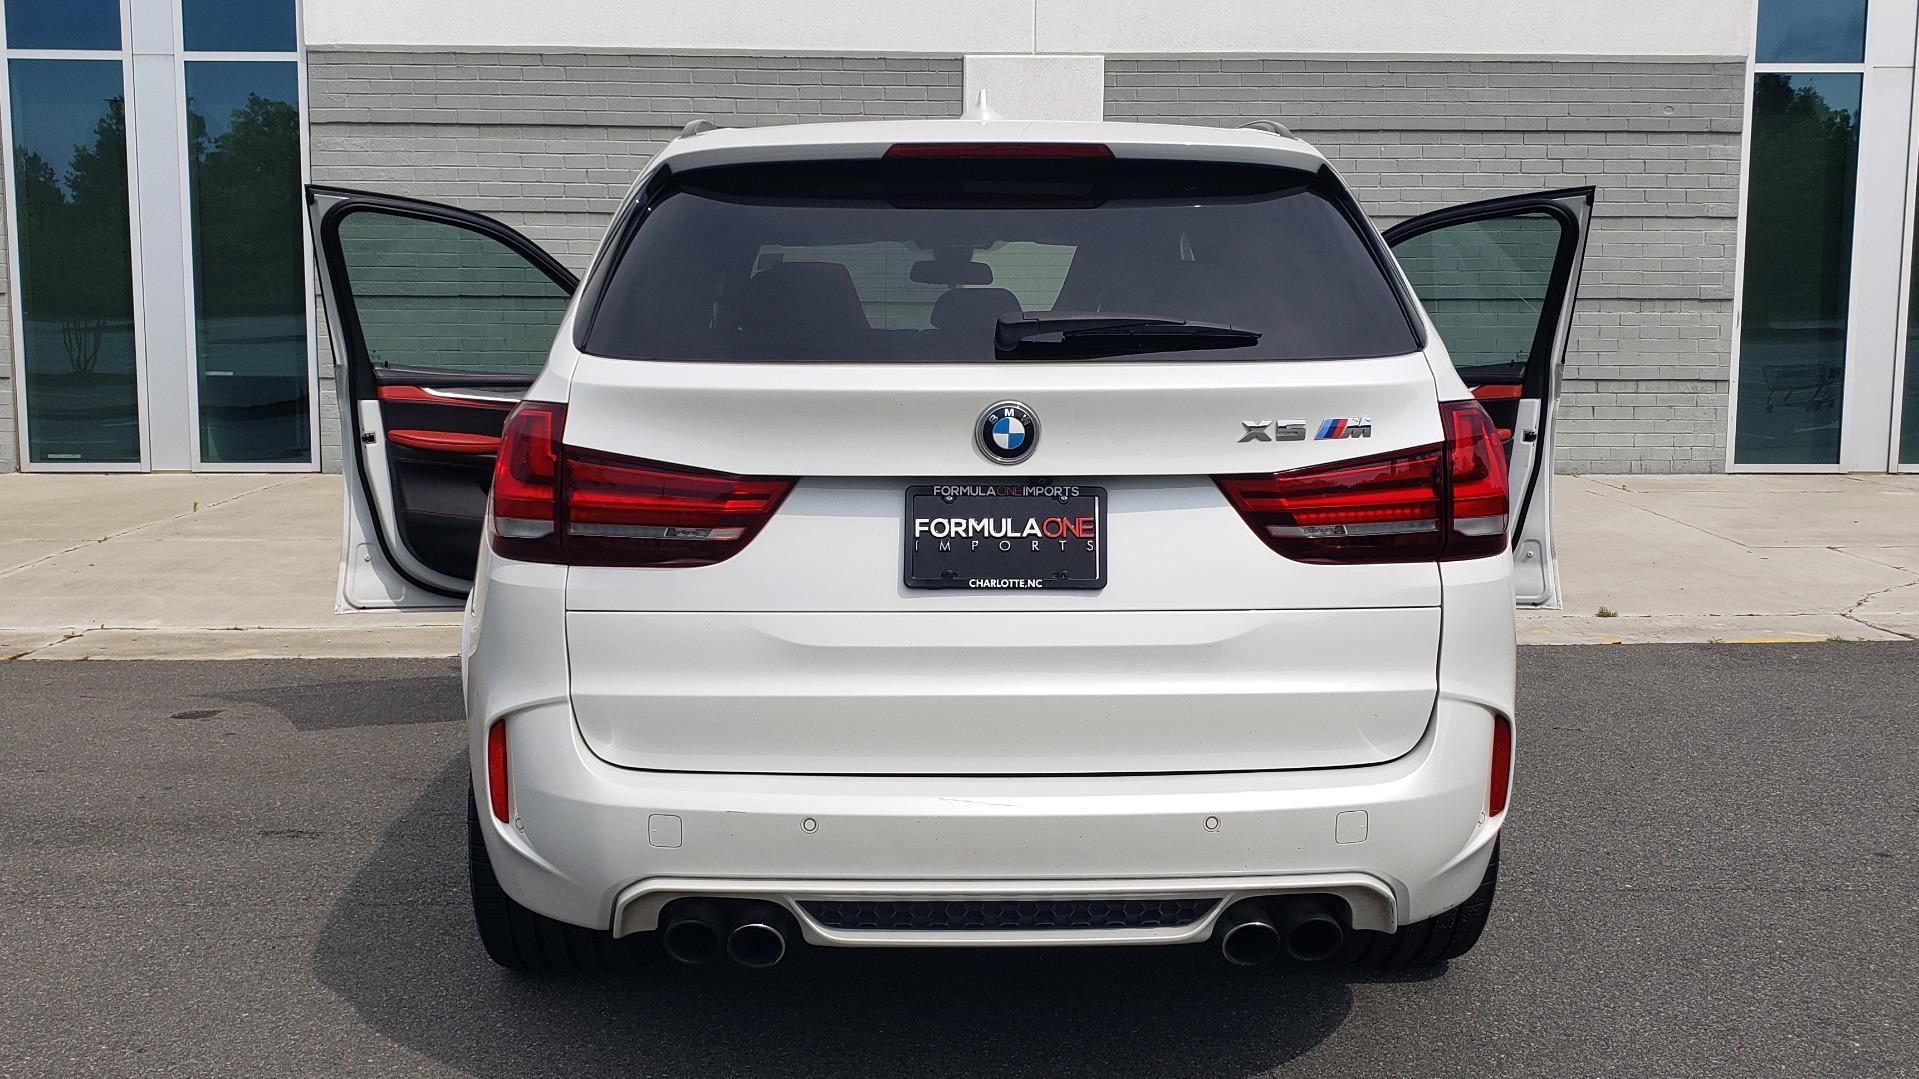 Used 2017 BMW X5 M EXECUTIVE PKG / NAV / DRVR ASST / BSM / HUD / HTD STS / WIFI for sale Sold at Formula Imports in Charlotte NC 28227 28